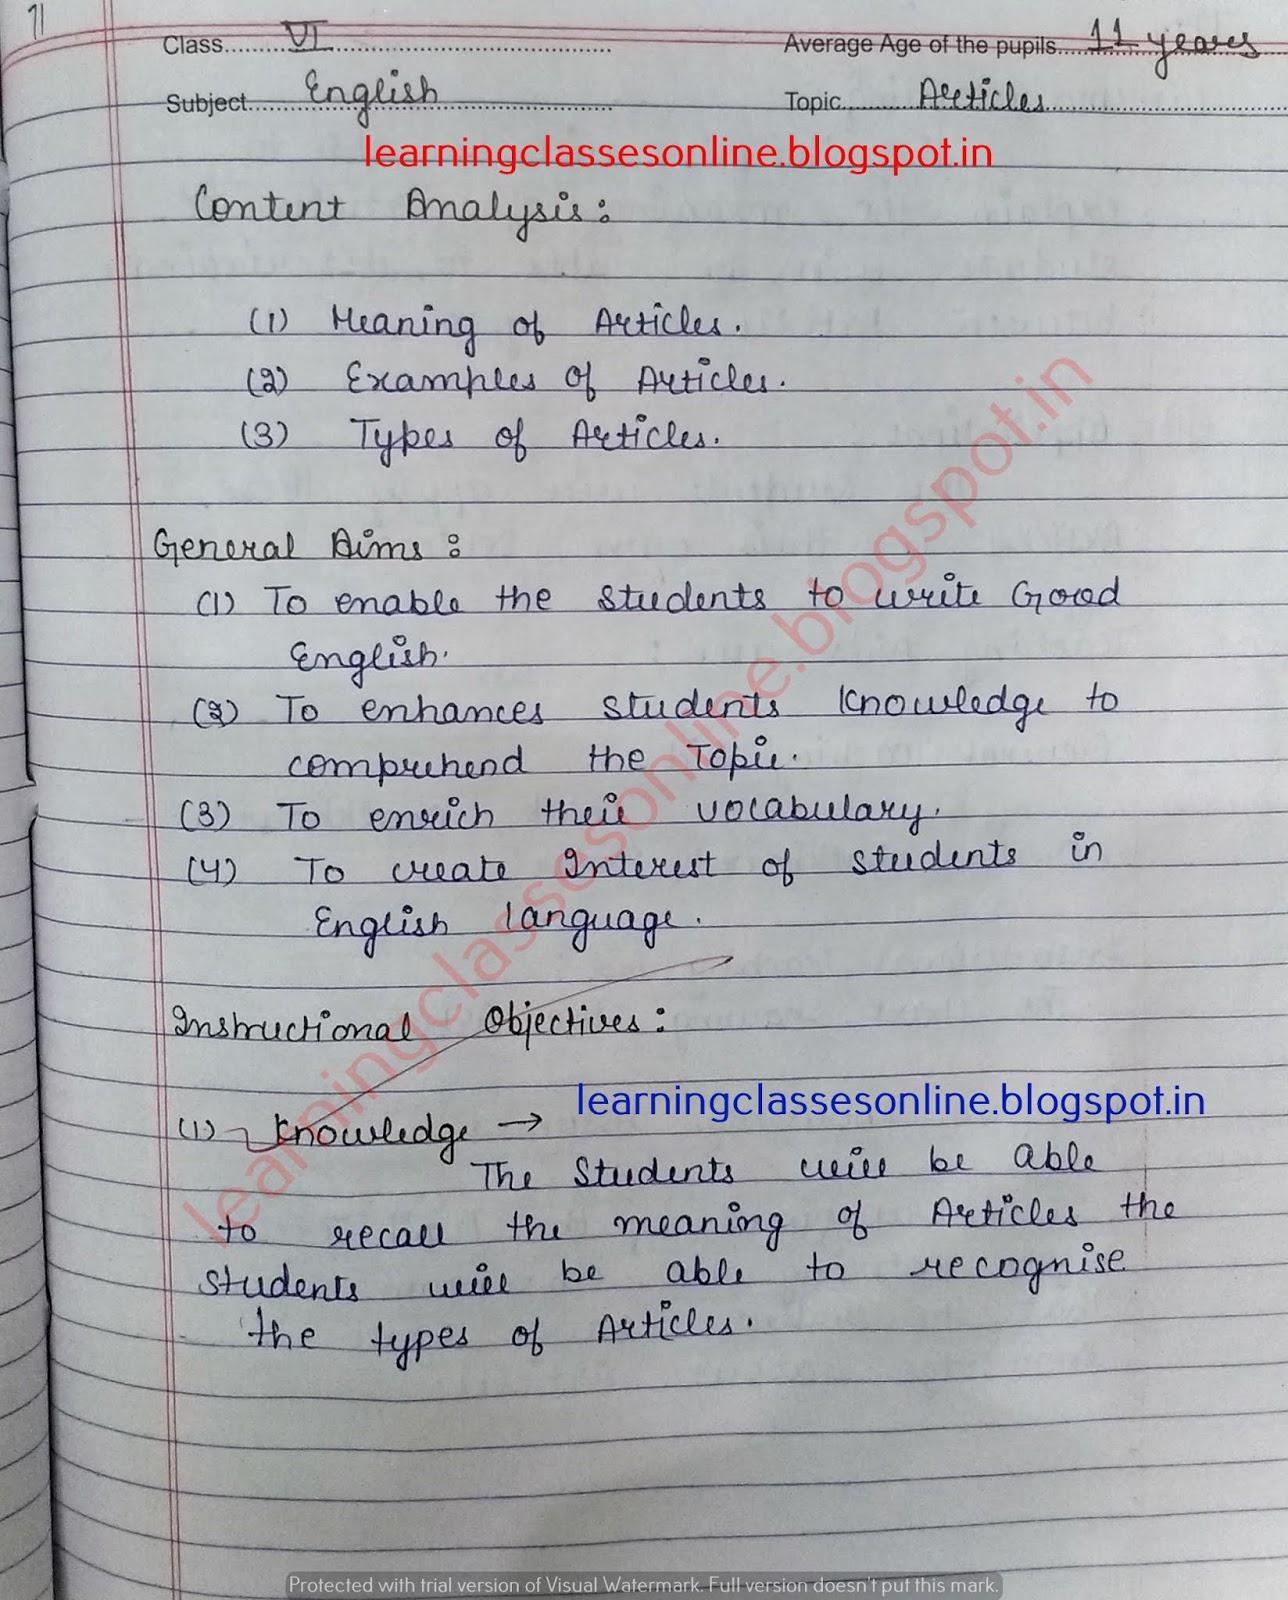 Pupil Teacher Teaching Lessons - Mega Lesson Plans - Topic ( Articles - Grammar ) - English Lesson Plan B.Ed